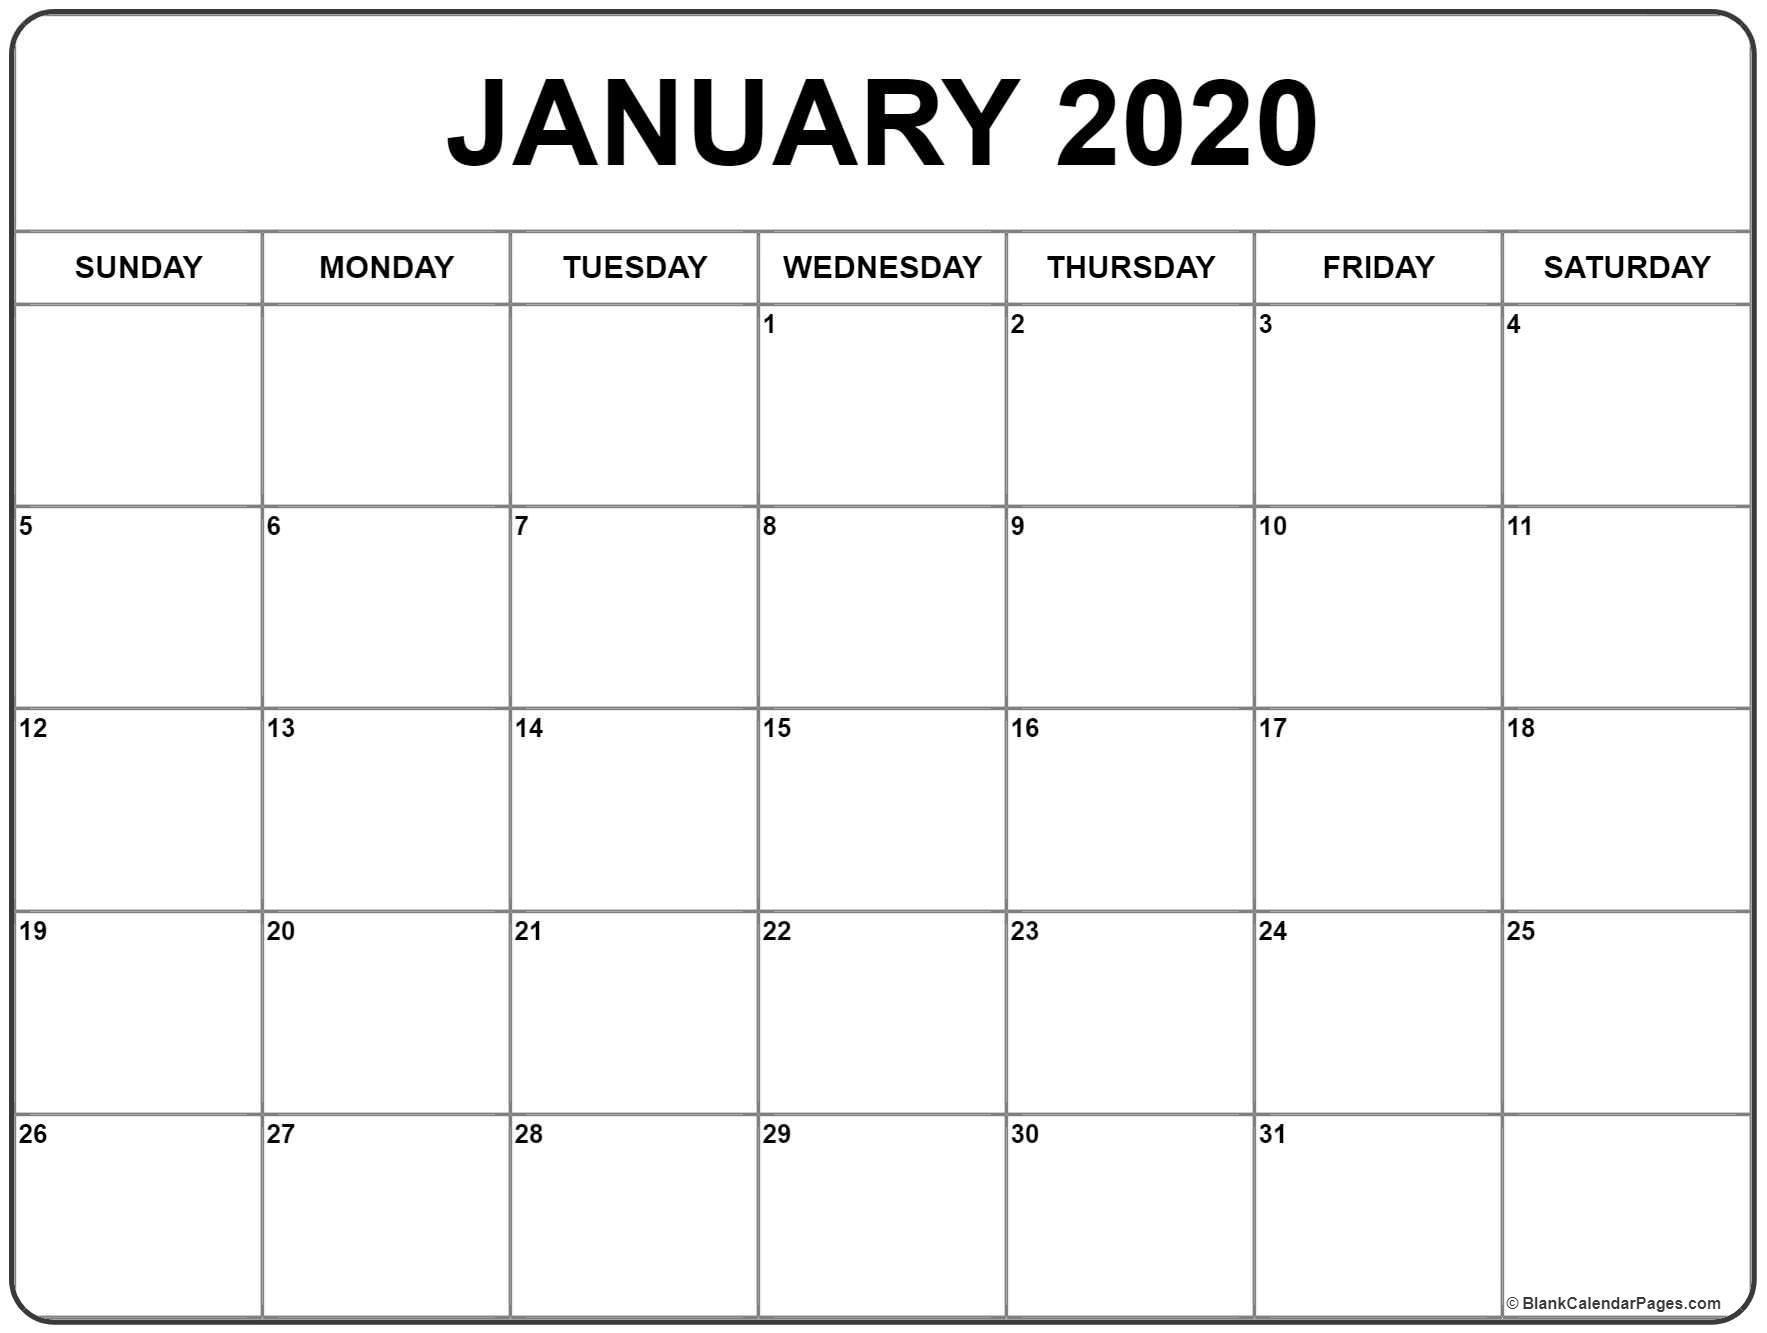 Islamic Calendar 2020 – Printable Week Calendar-January 2020 Arabic Calendar